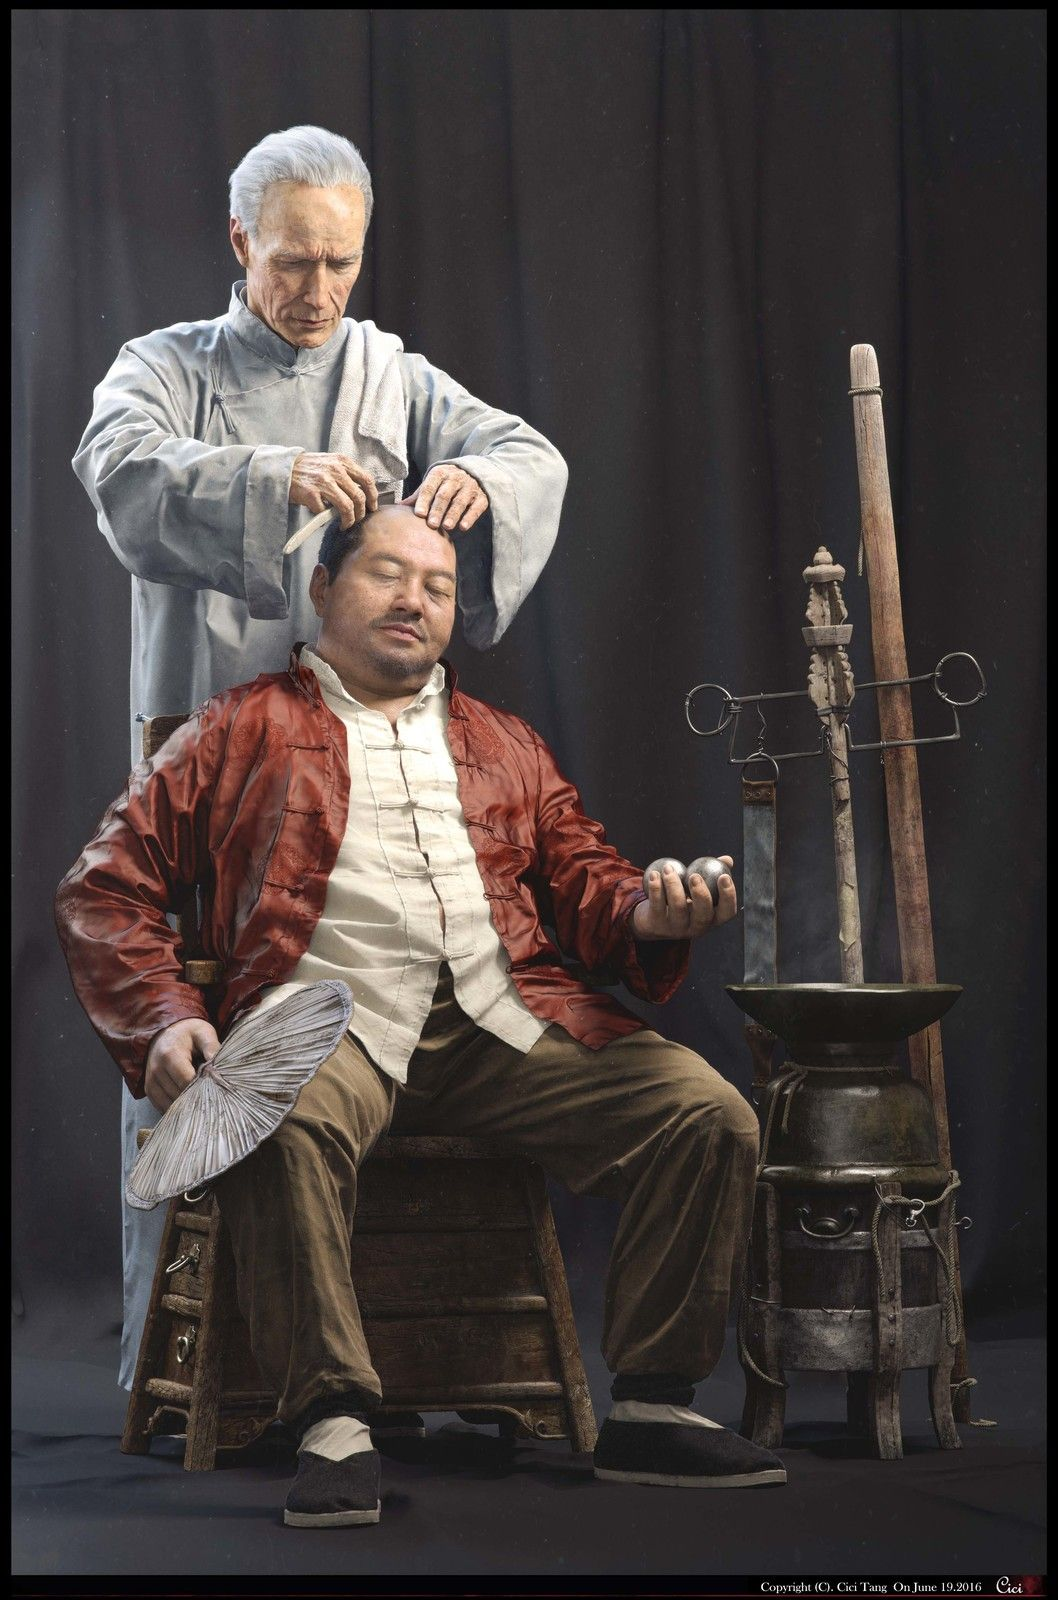 Exotic Experience, Mengxi Tang on ArtStation at https://www.artstation.com/artwork/1BPwq